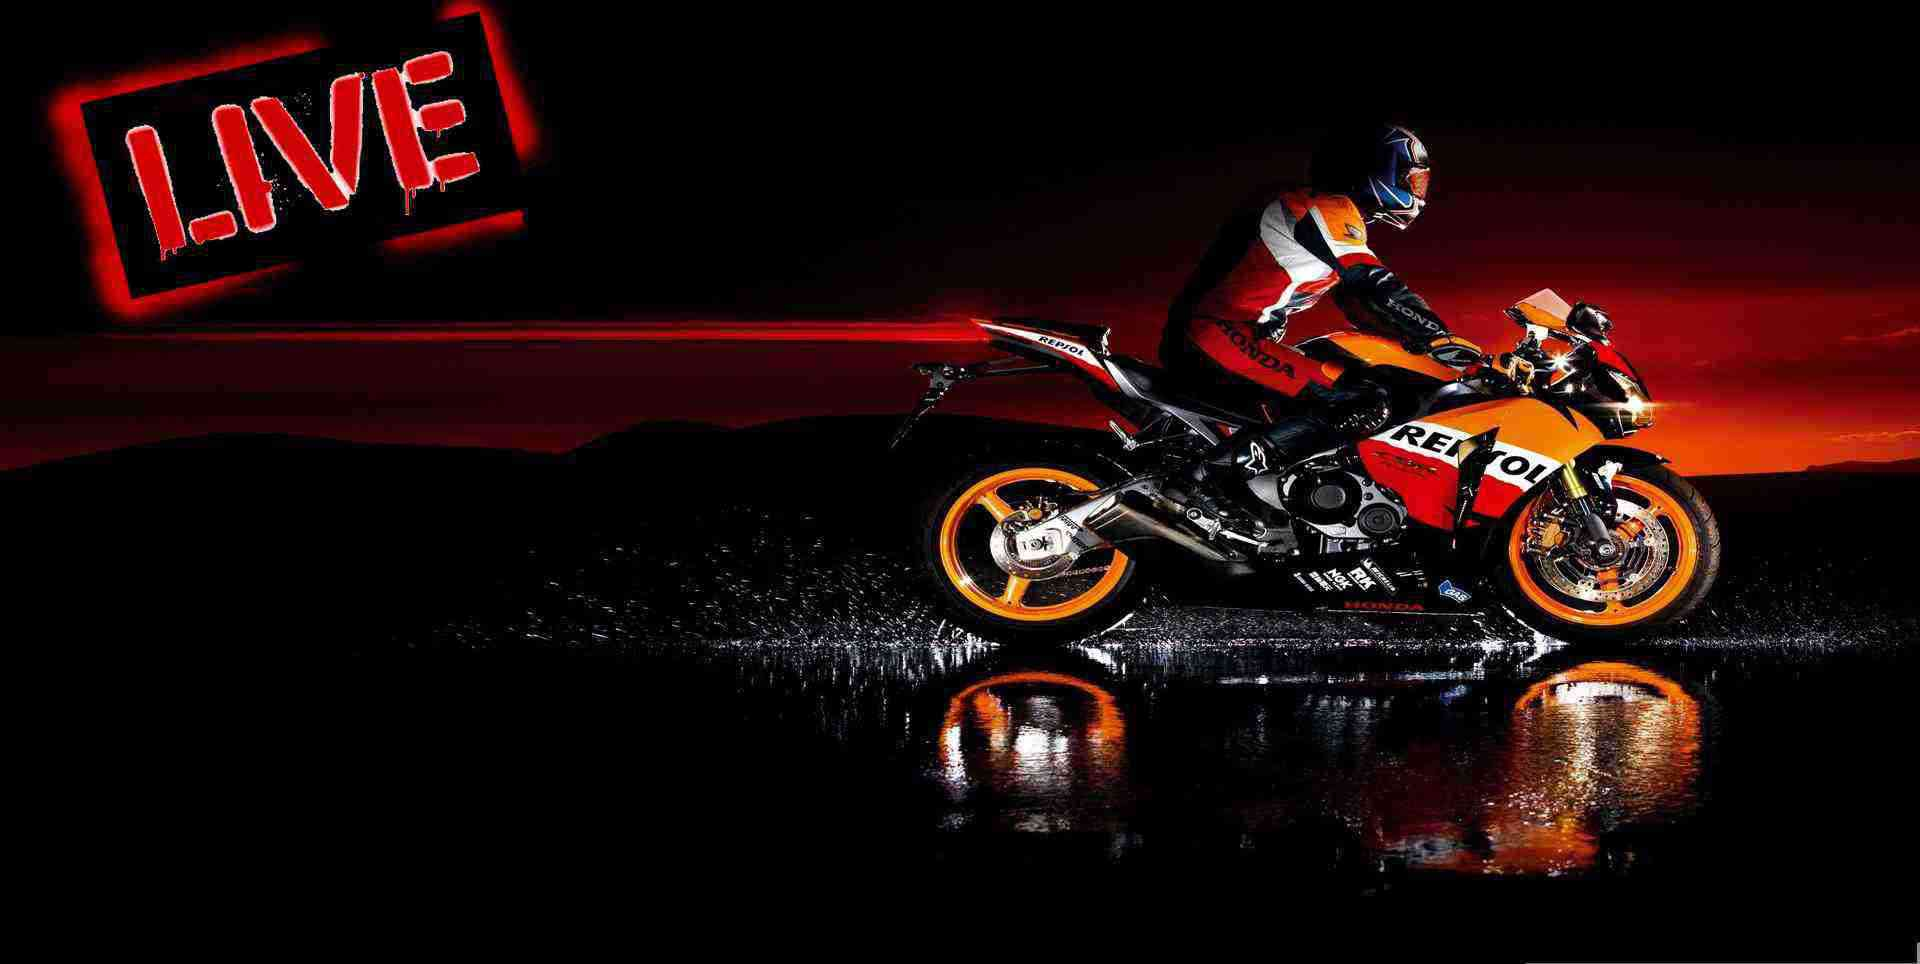 motogp-spanish-grand-prix-2015-live-streaming